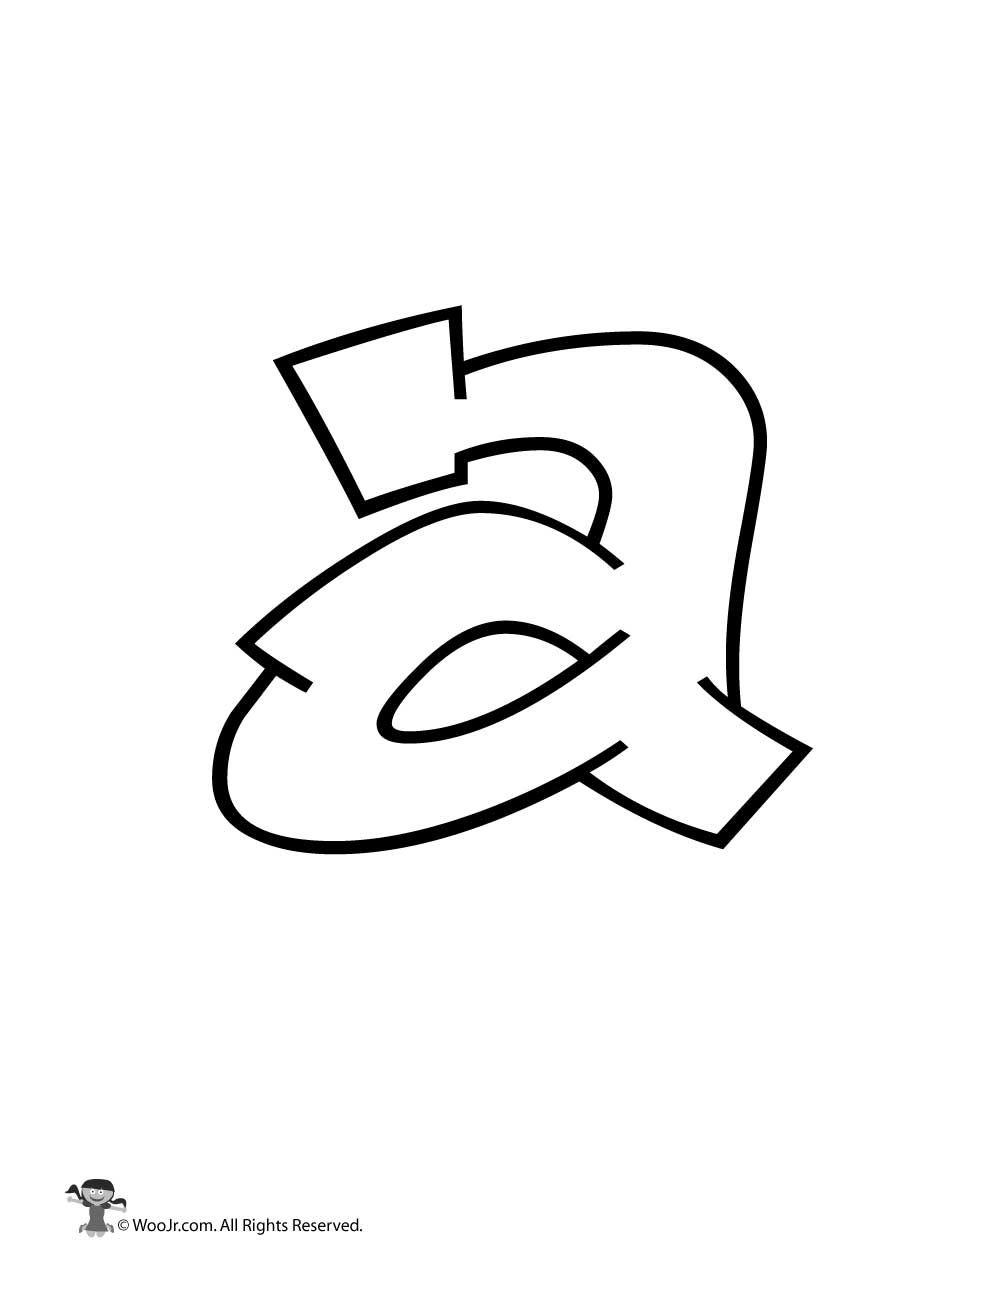 Graffiti Lowercase Letter A In 2020 Graffiti Lettering Graffiti